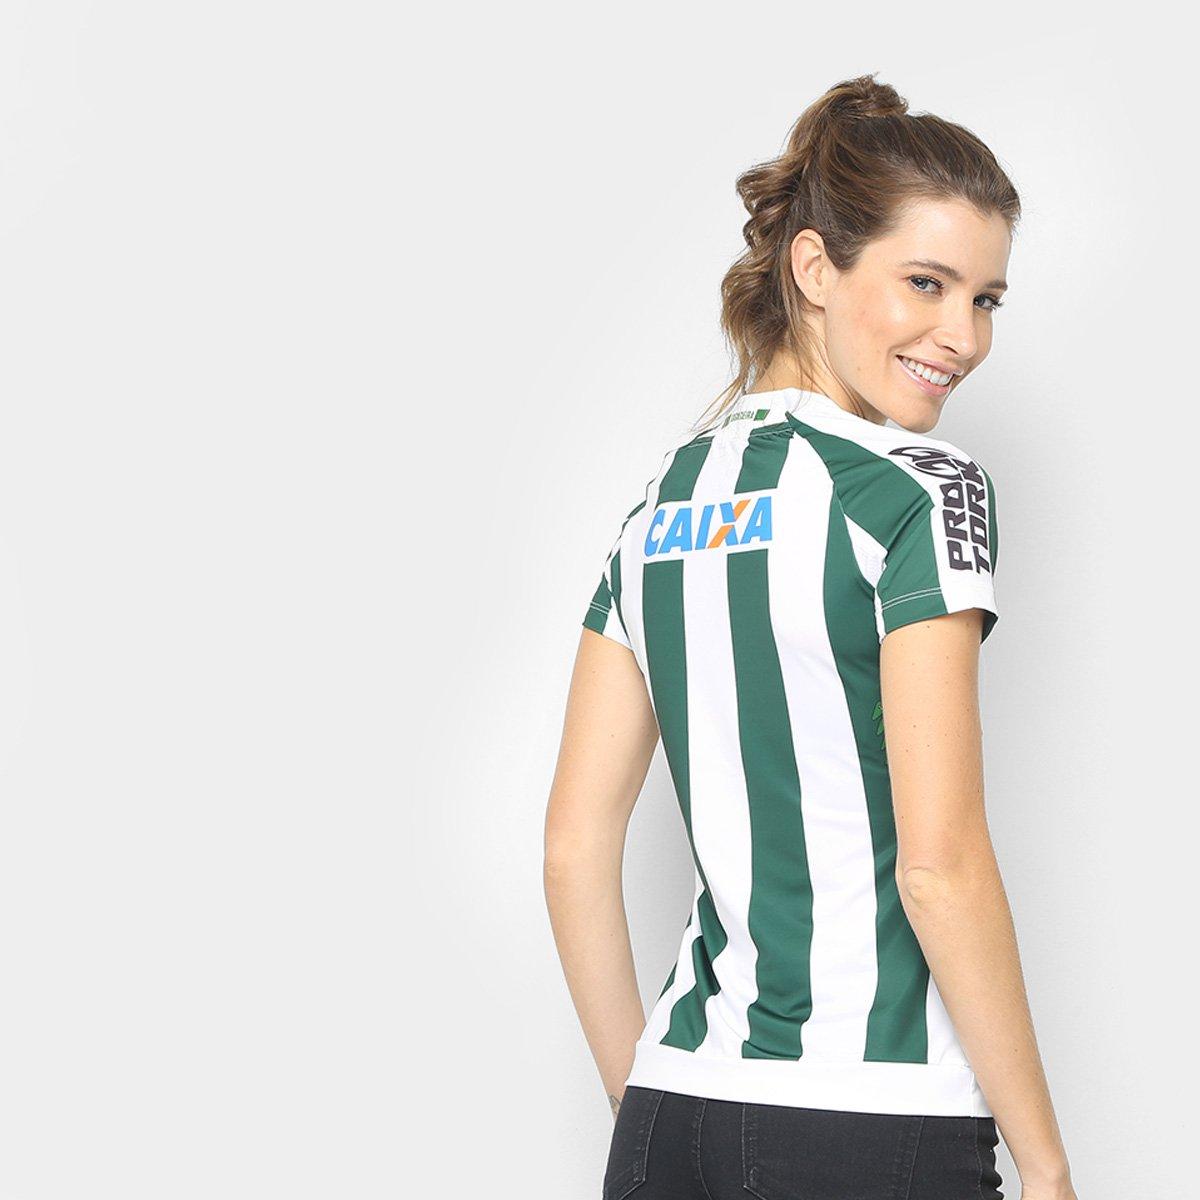 ... Camisa Coritiba II 2018 s n° C Patrocínio - Jogador 1909 Feminina ... 187718118e71d